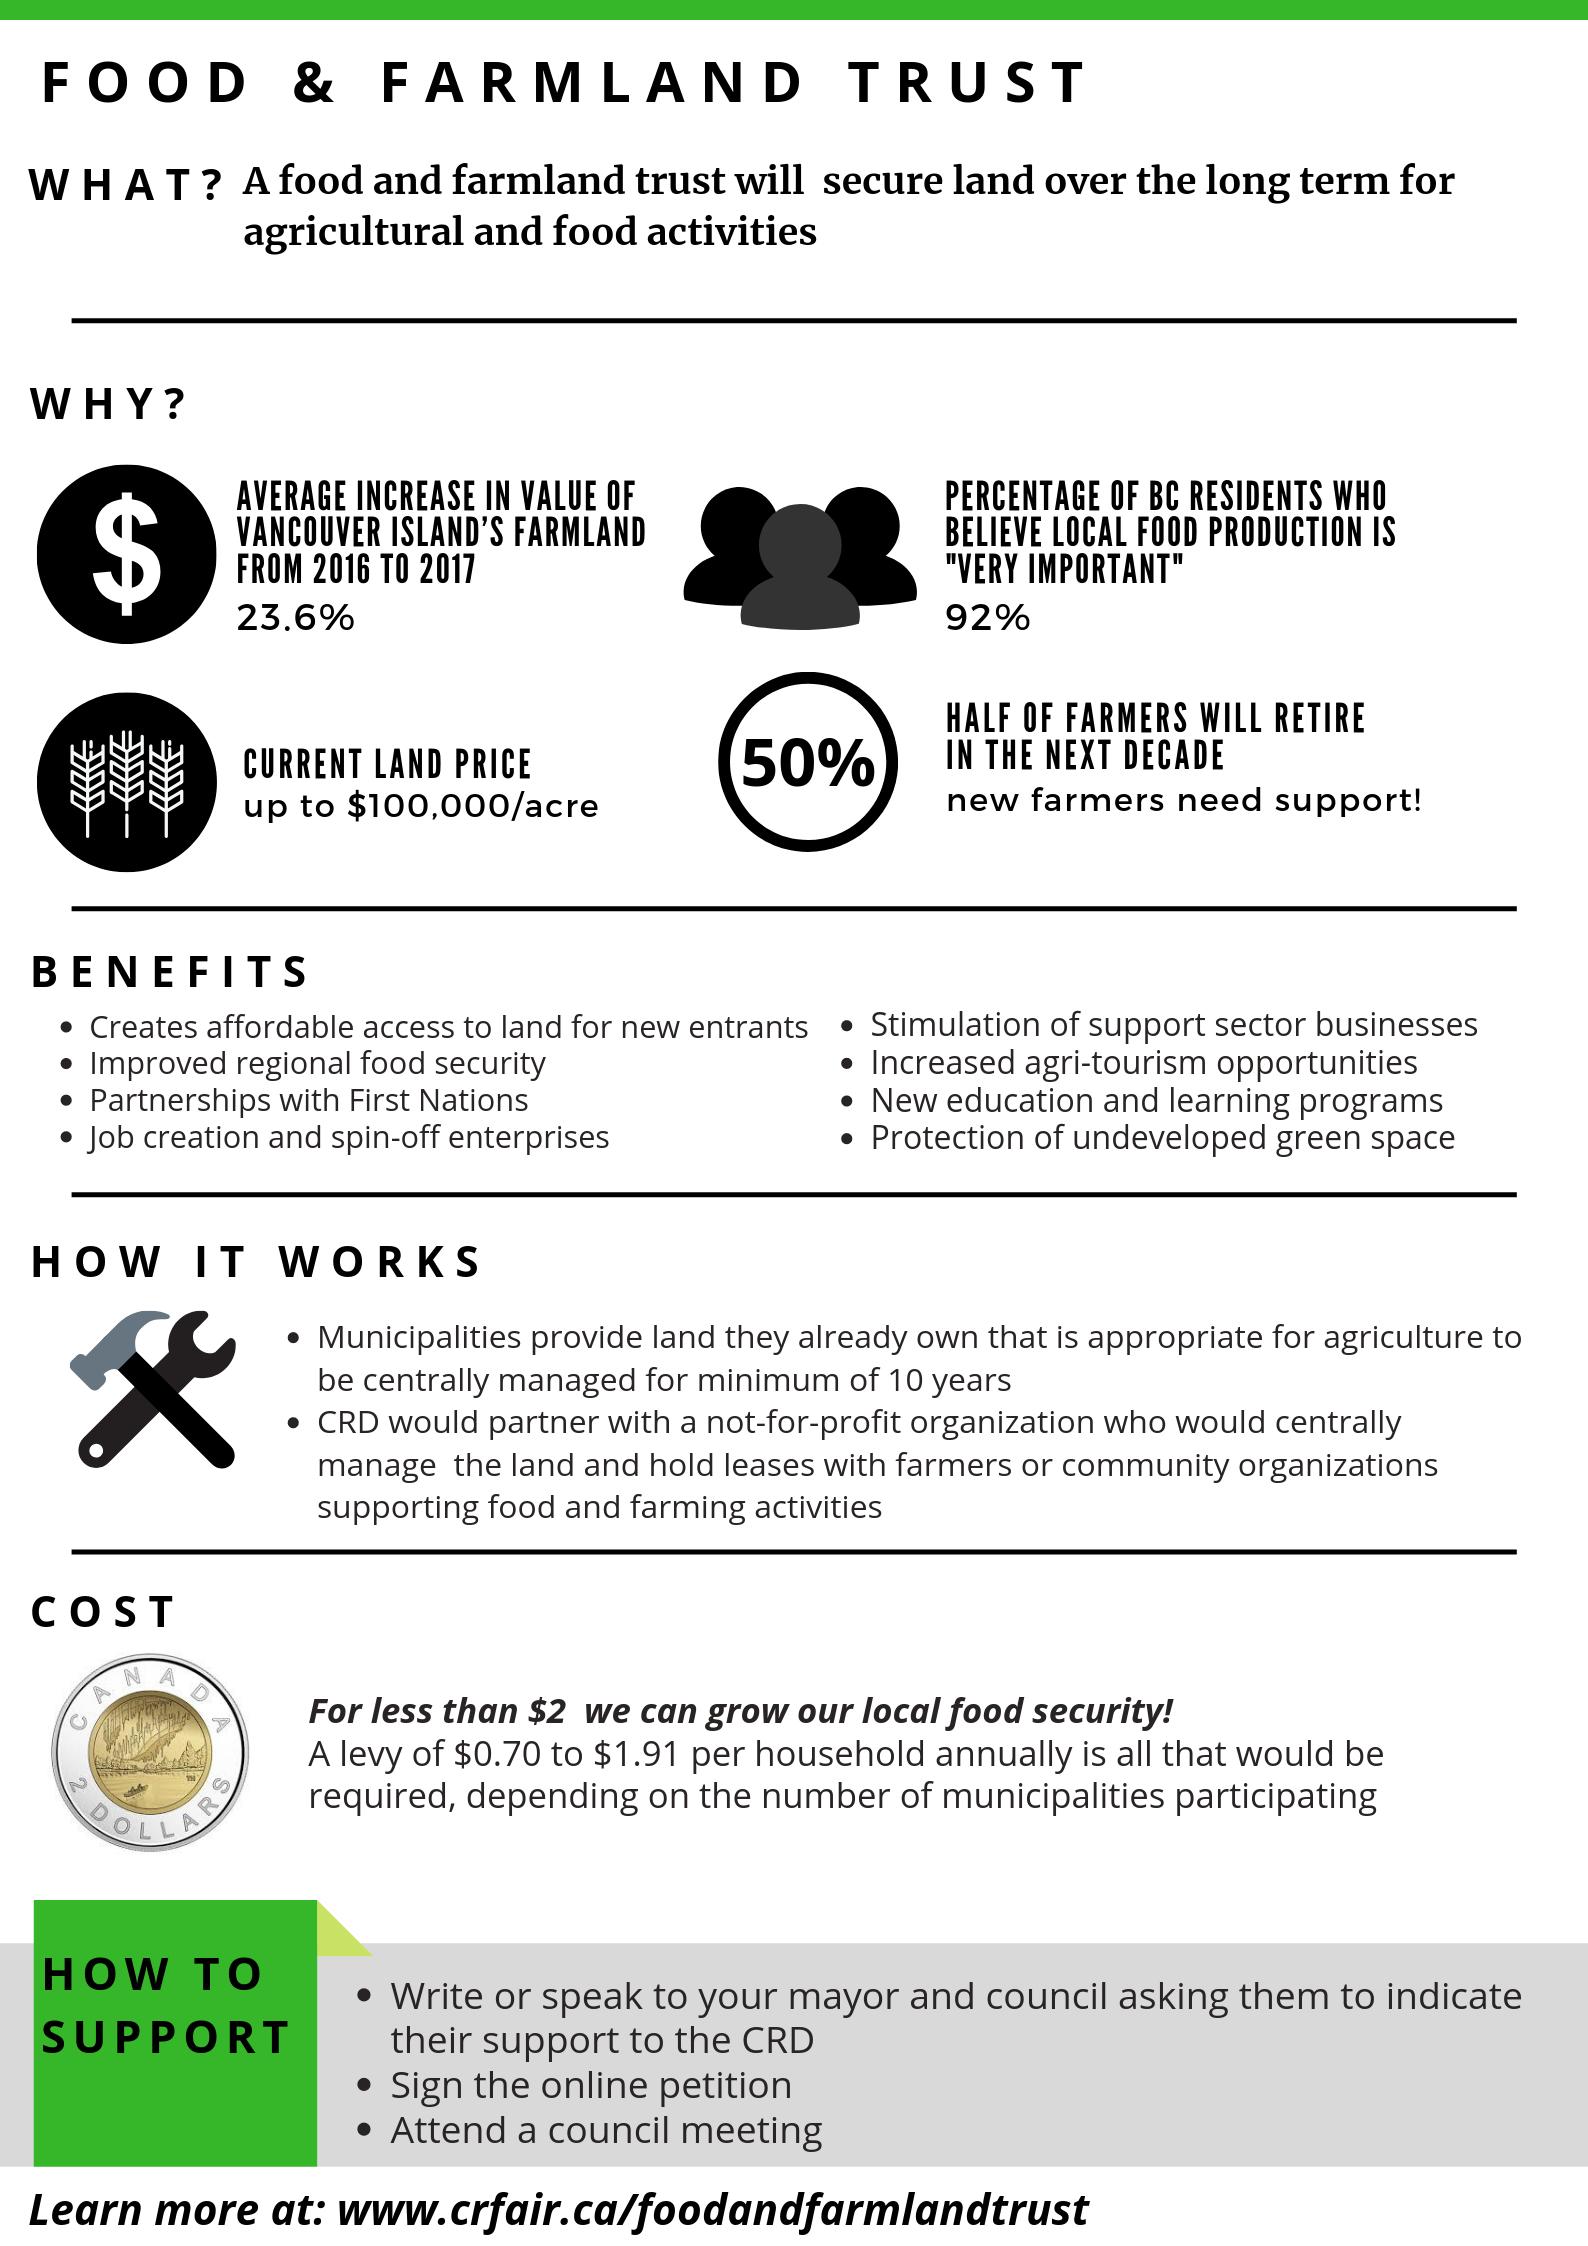 2019_CRFAIR_CRD_FoodlandTrust_Infographic.png